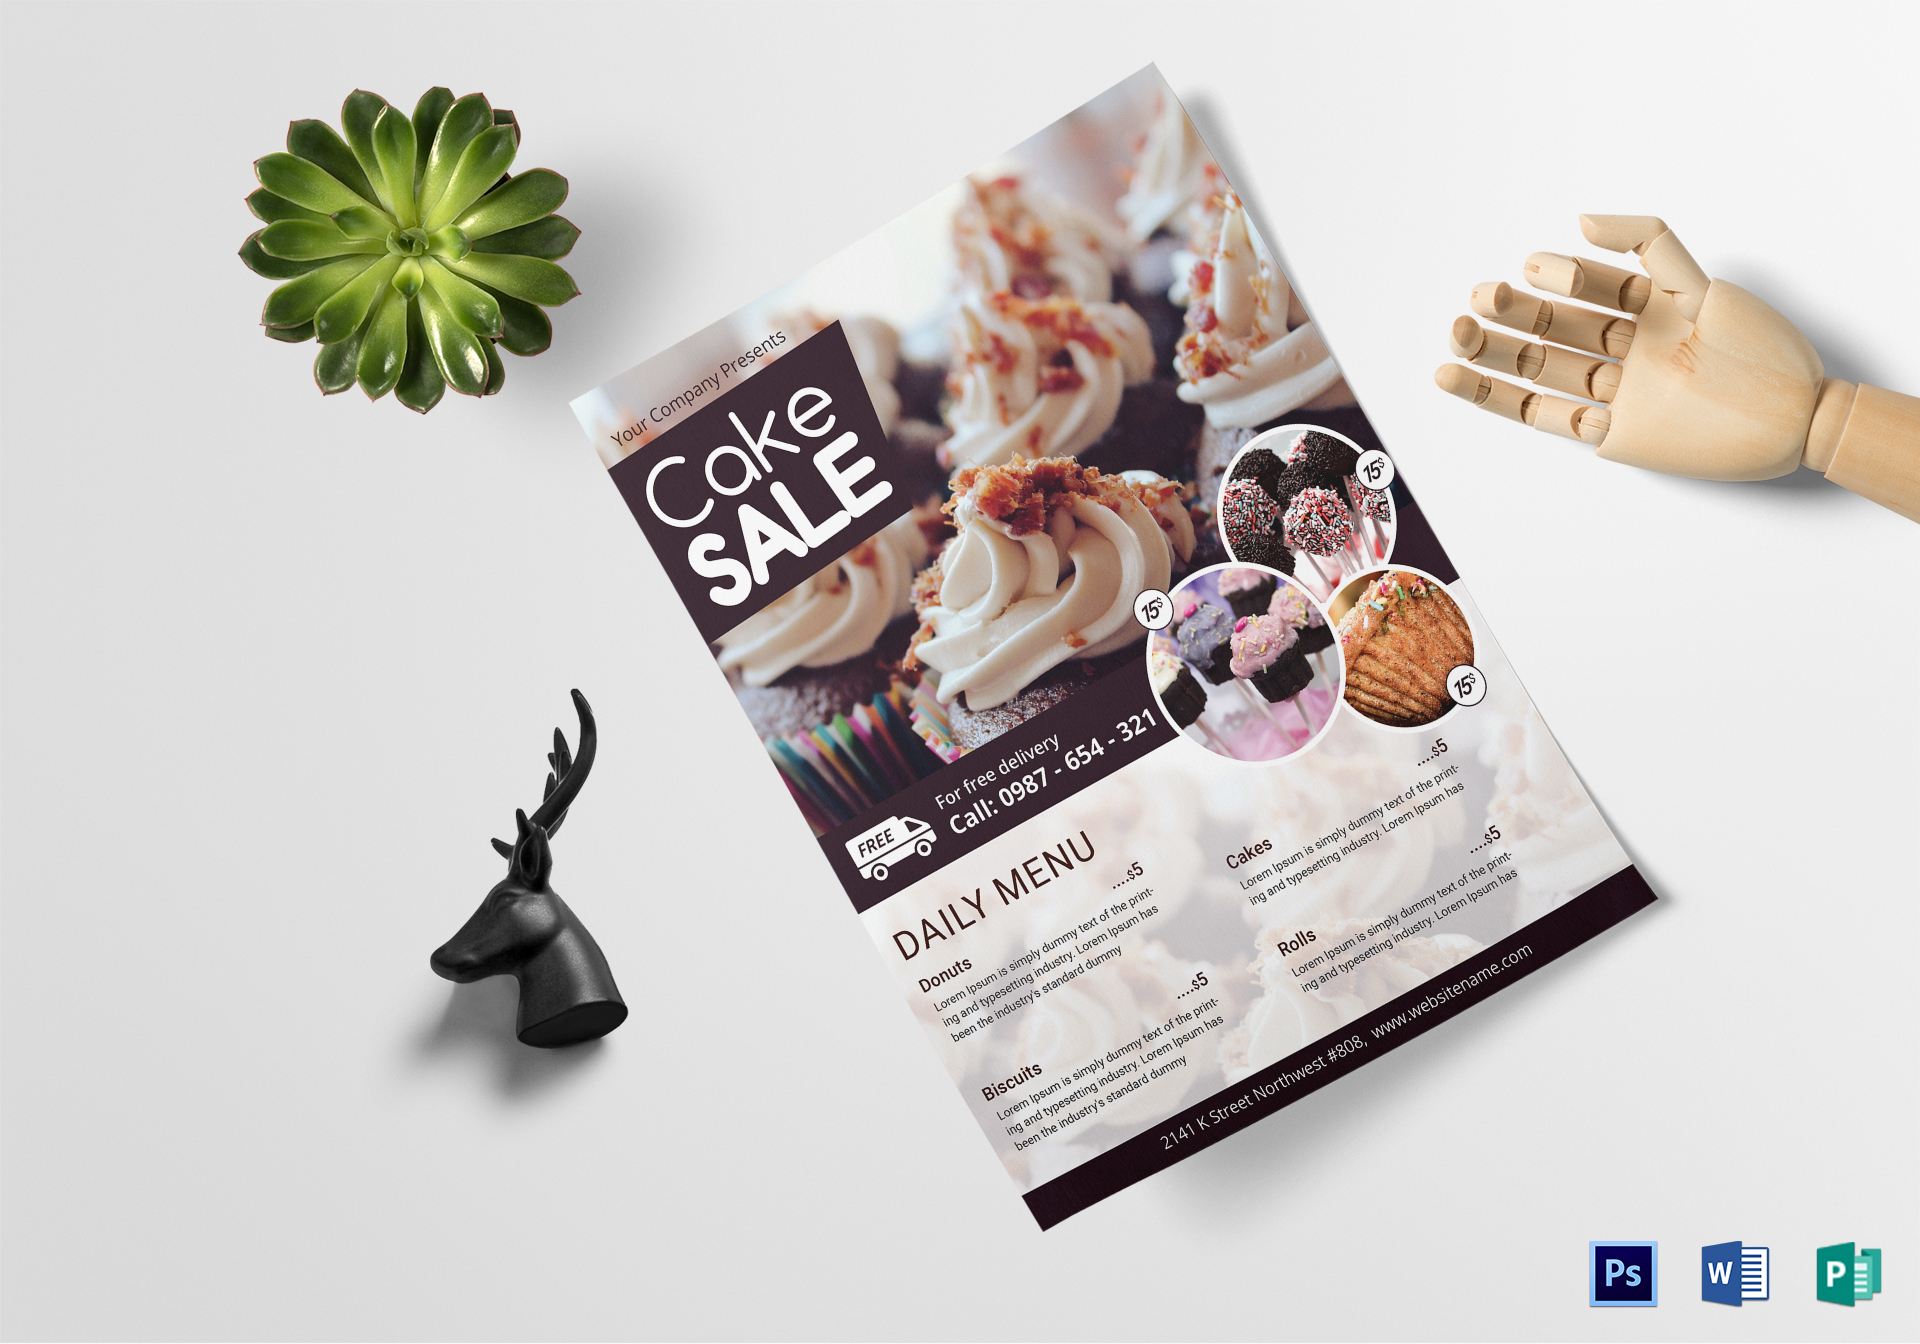 Cake Sale Flyer